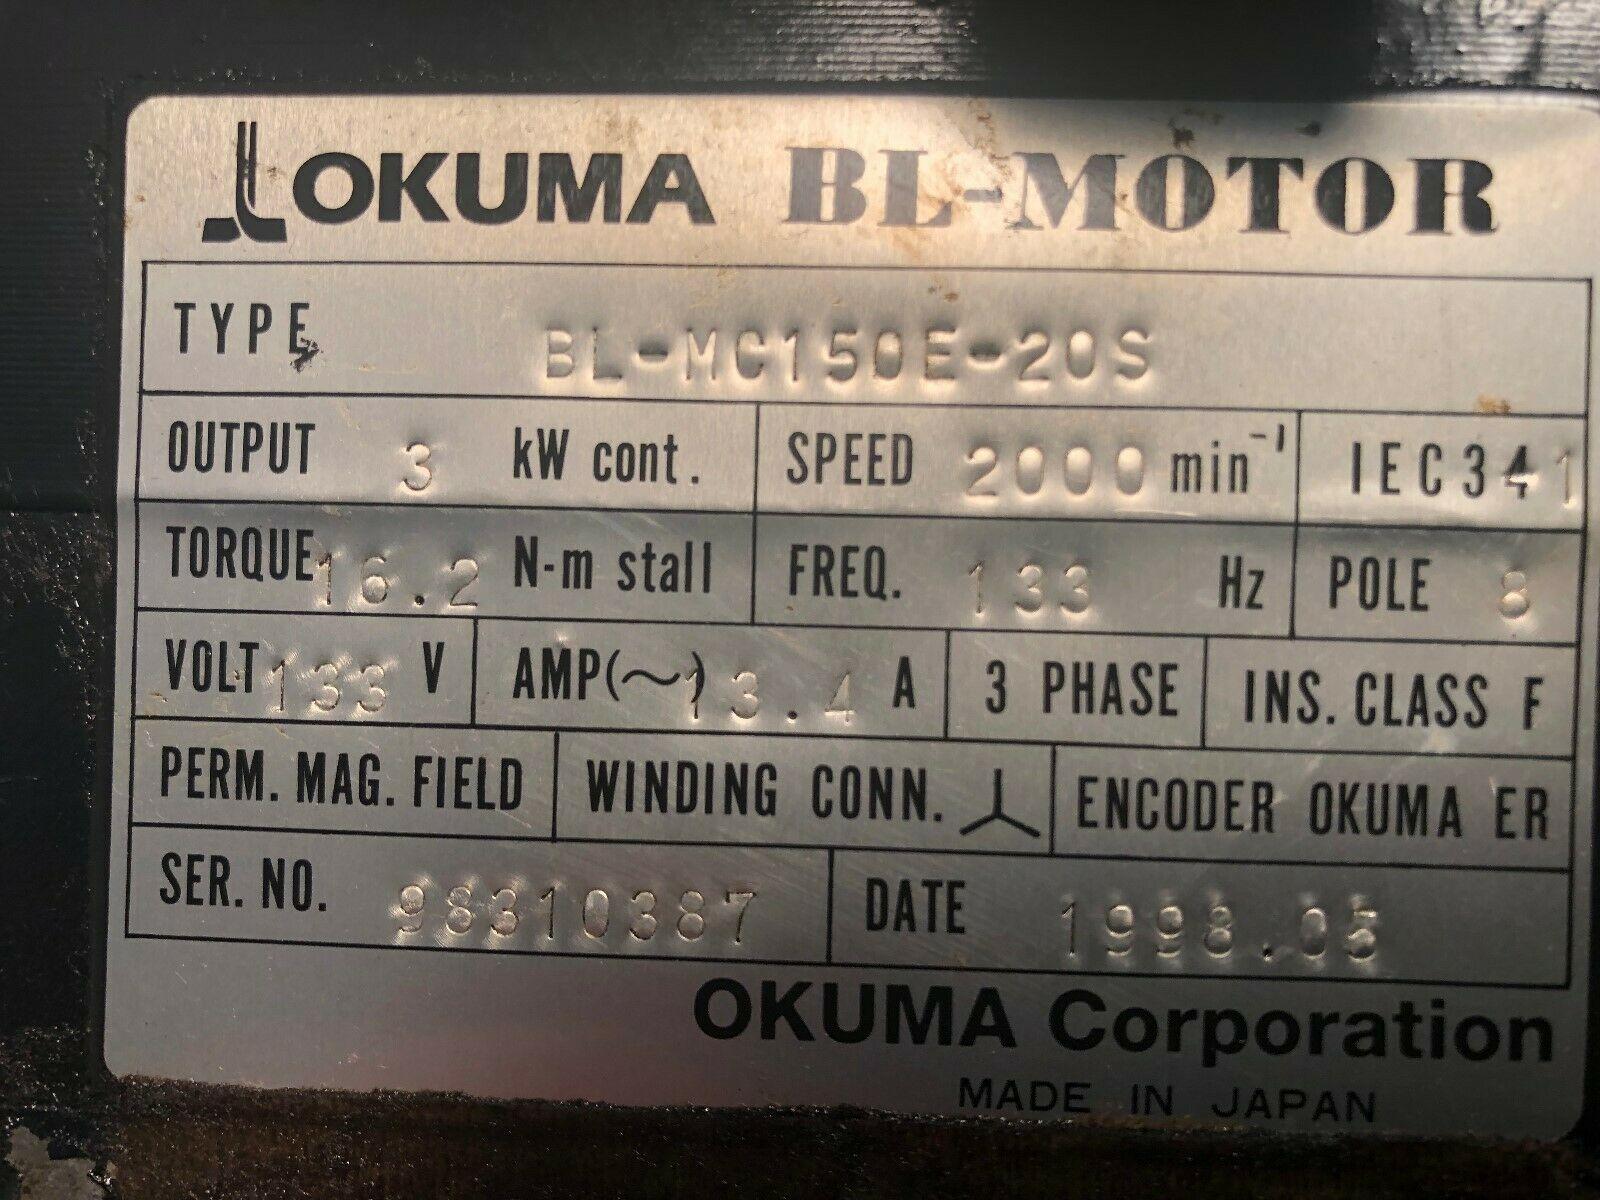 Okuma BL Servo Motor, Type: BL-MC150E-20S, S/N: 98310387, Came off a working Okuma L1060 Turning Center.